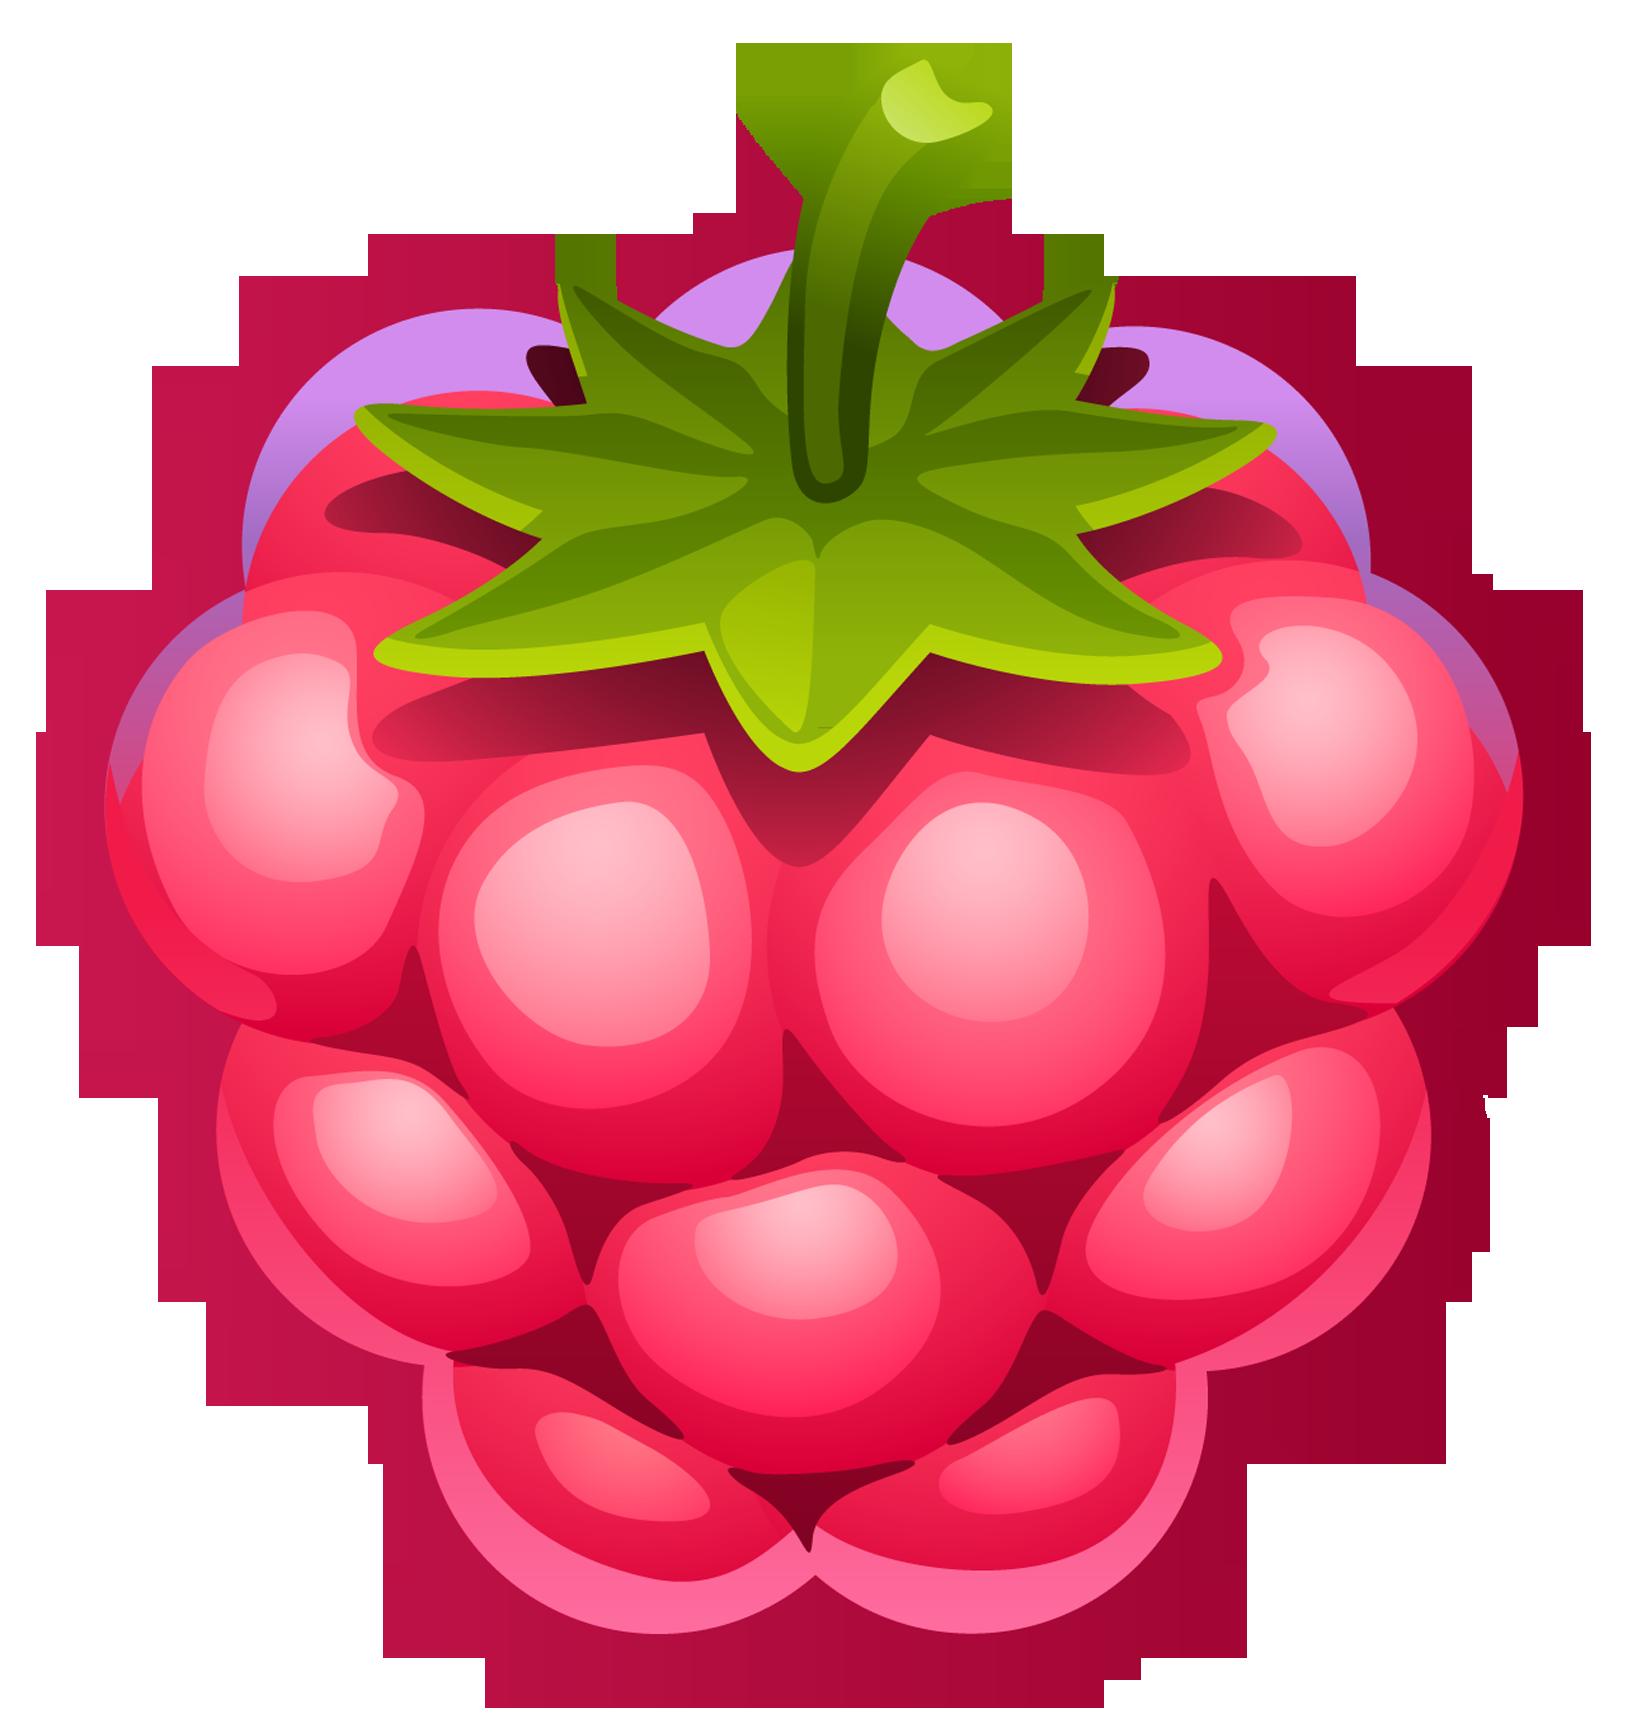 Rapsberry clipart Photo  Raspberry #RaspberryClipart org